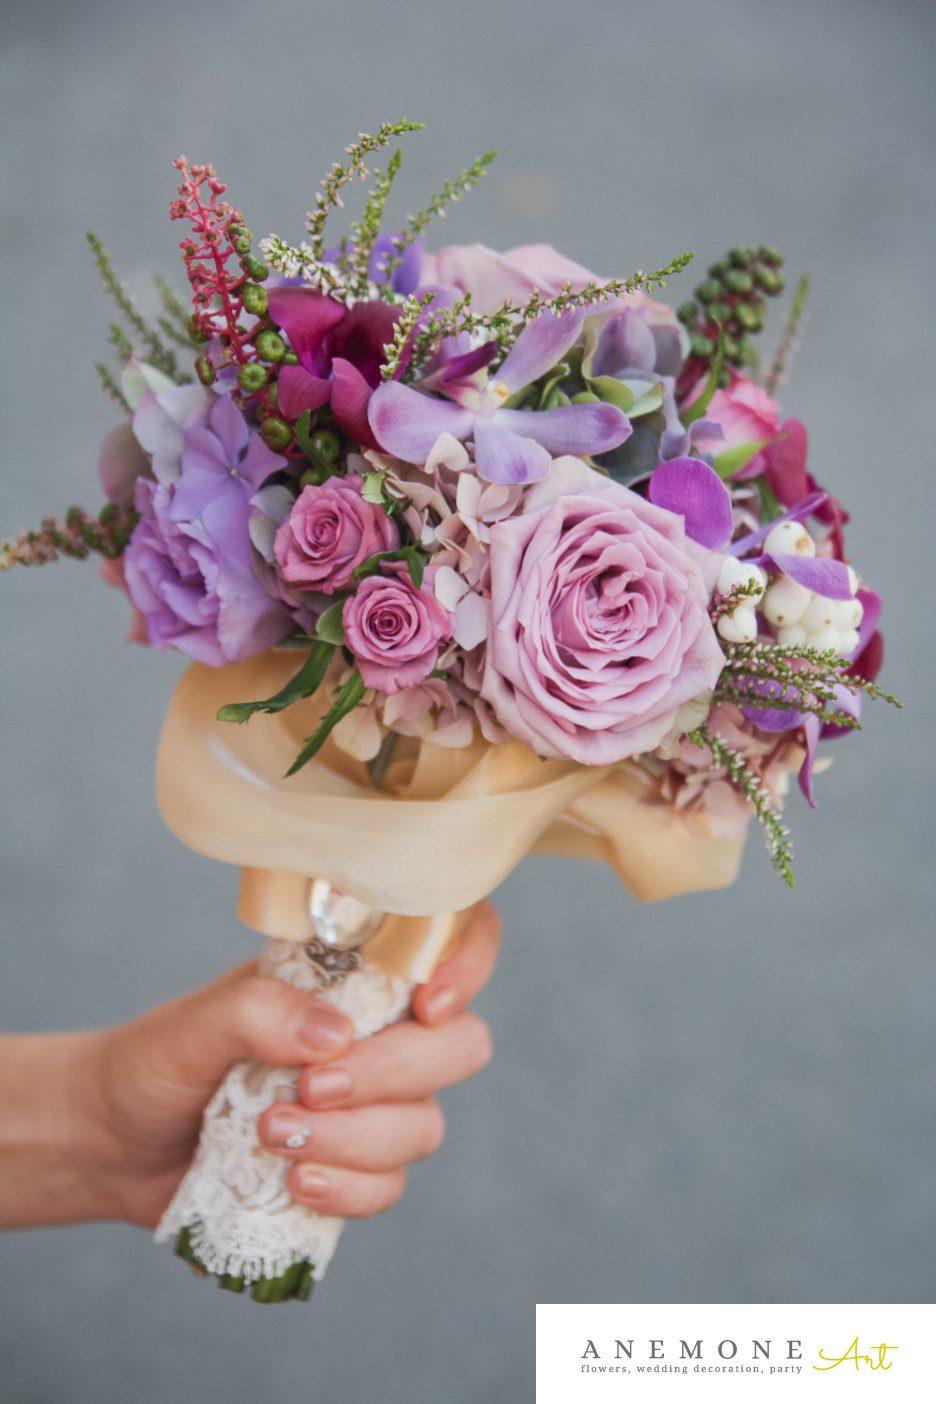 Poza, foto cu Flori de nunta buchet cununie, mov in Arad, Timisoara, Oradea (wedding flowers, bouquets) nunta Arad, Timisoara, Oradea